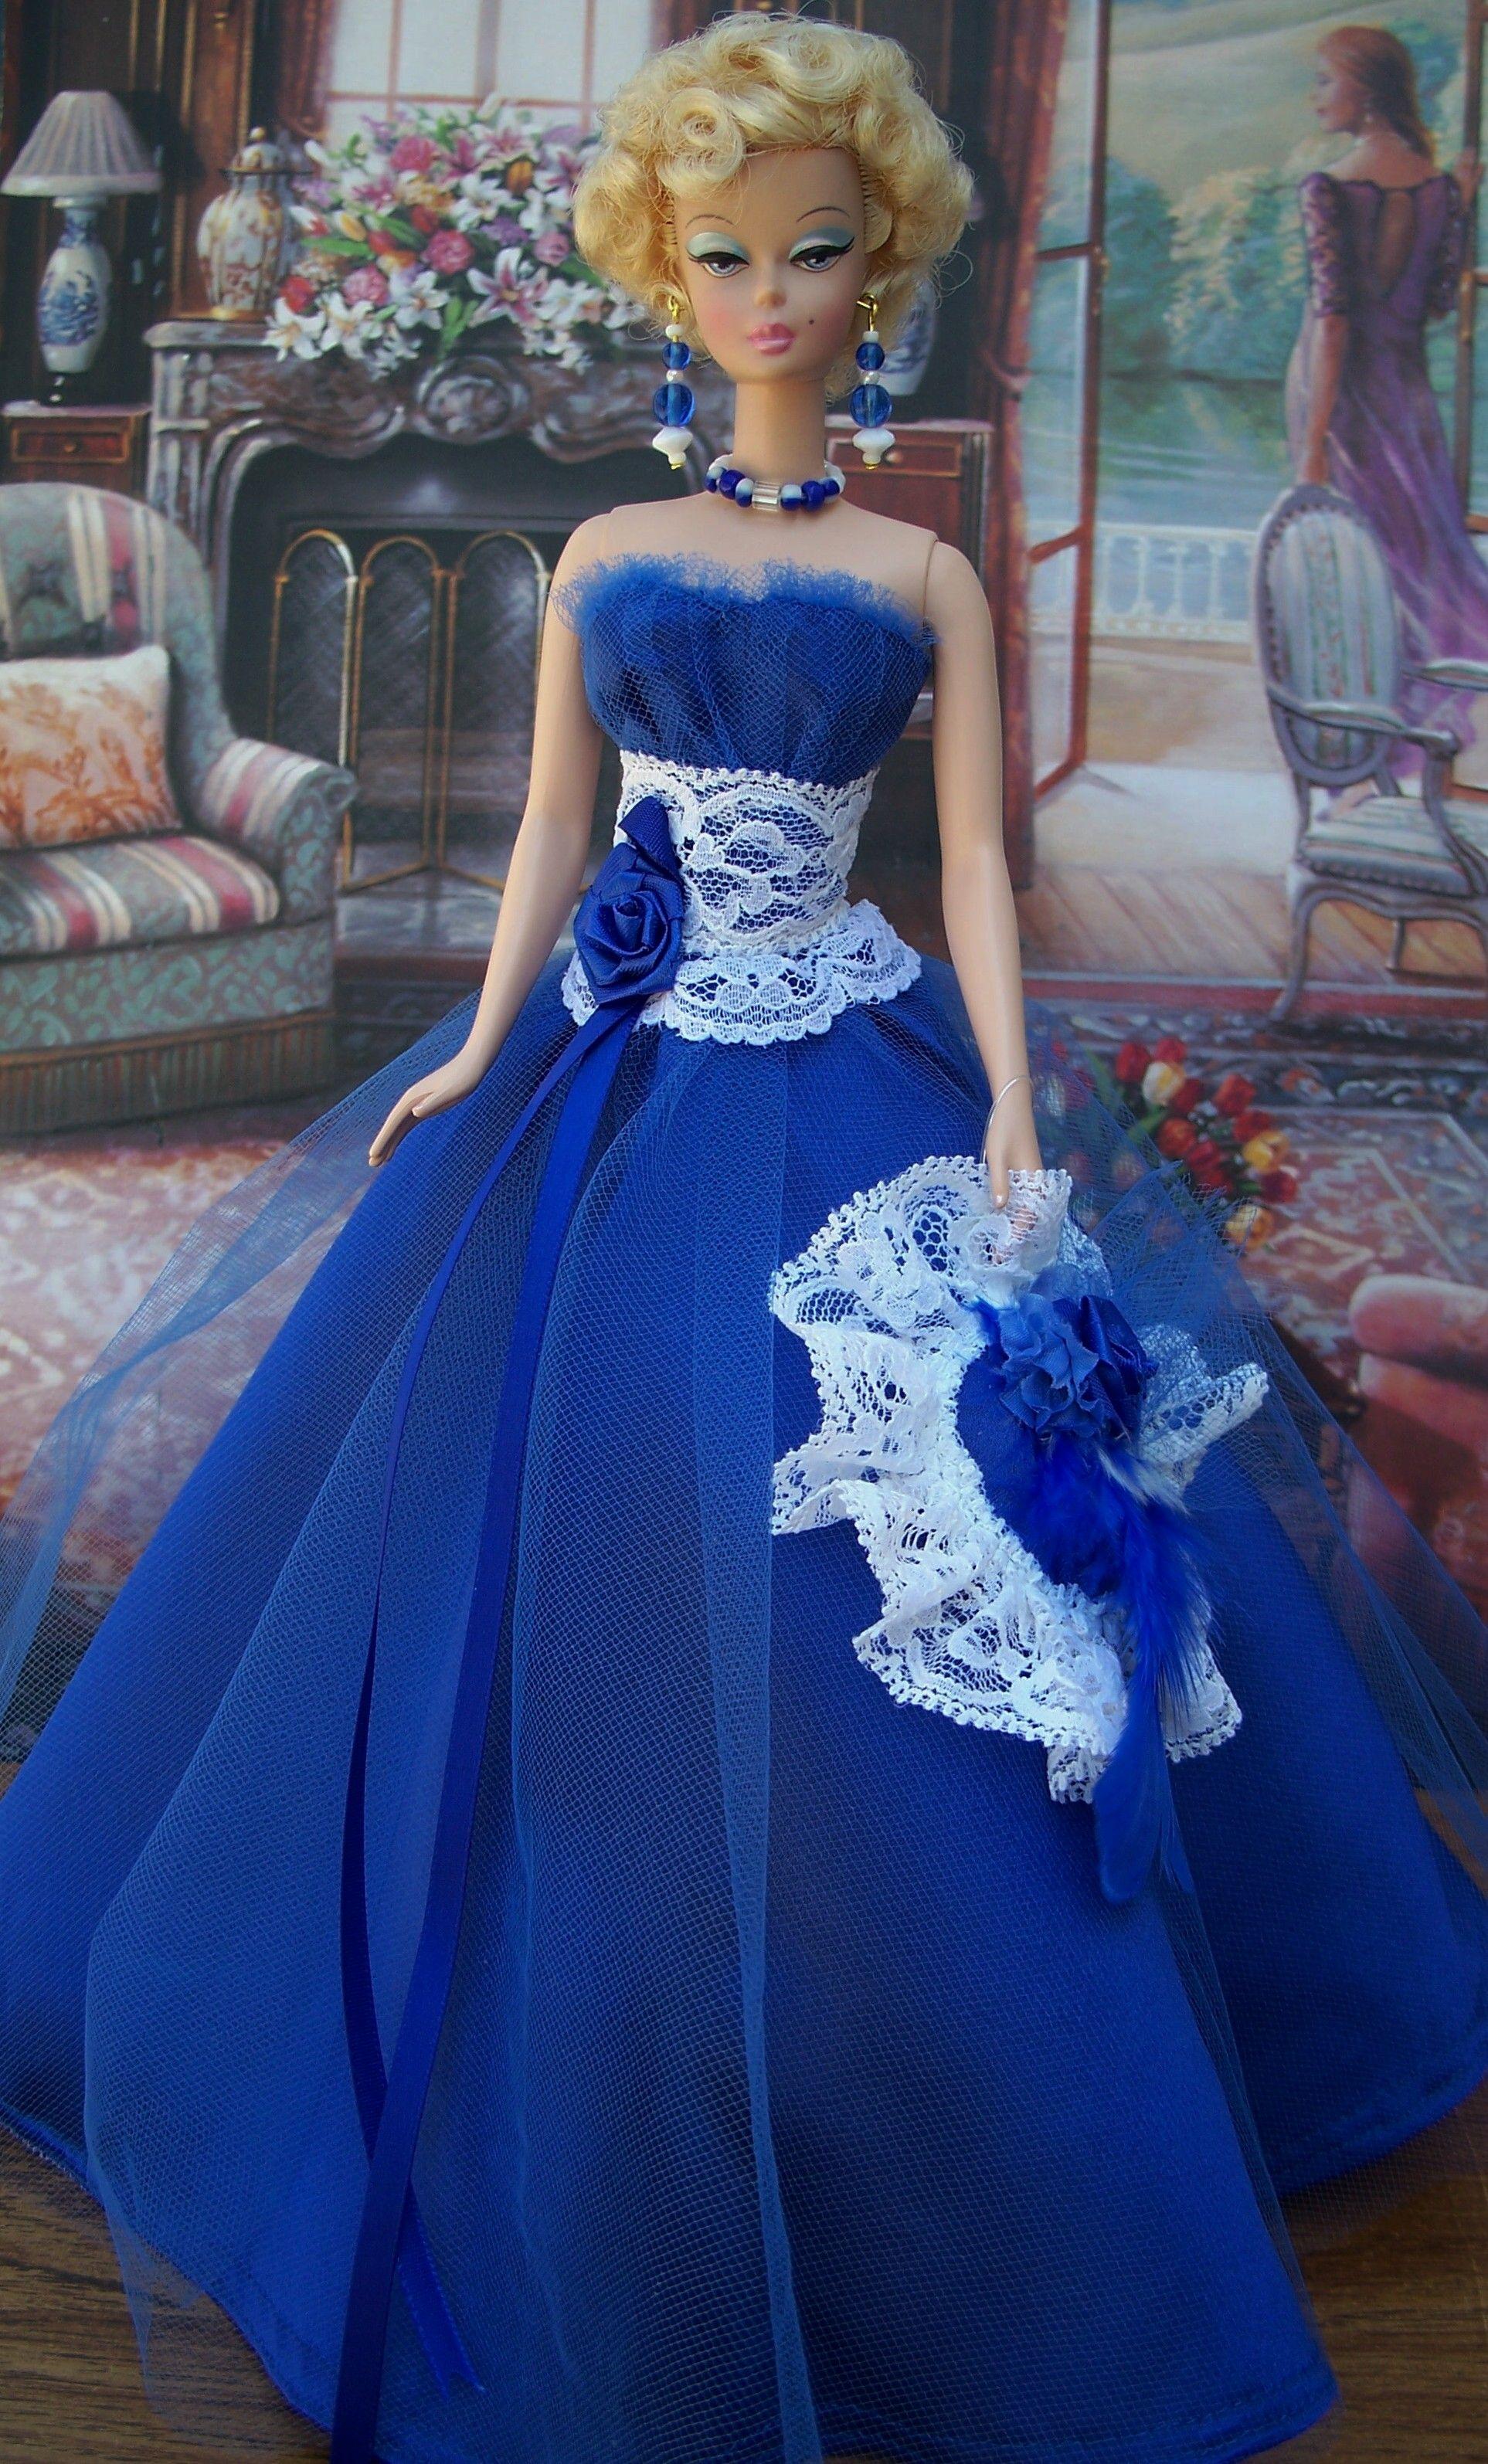 OOAK Doll Fashion by Karen glammourdoll | OOAK Fashion-DOLL ...